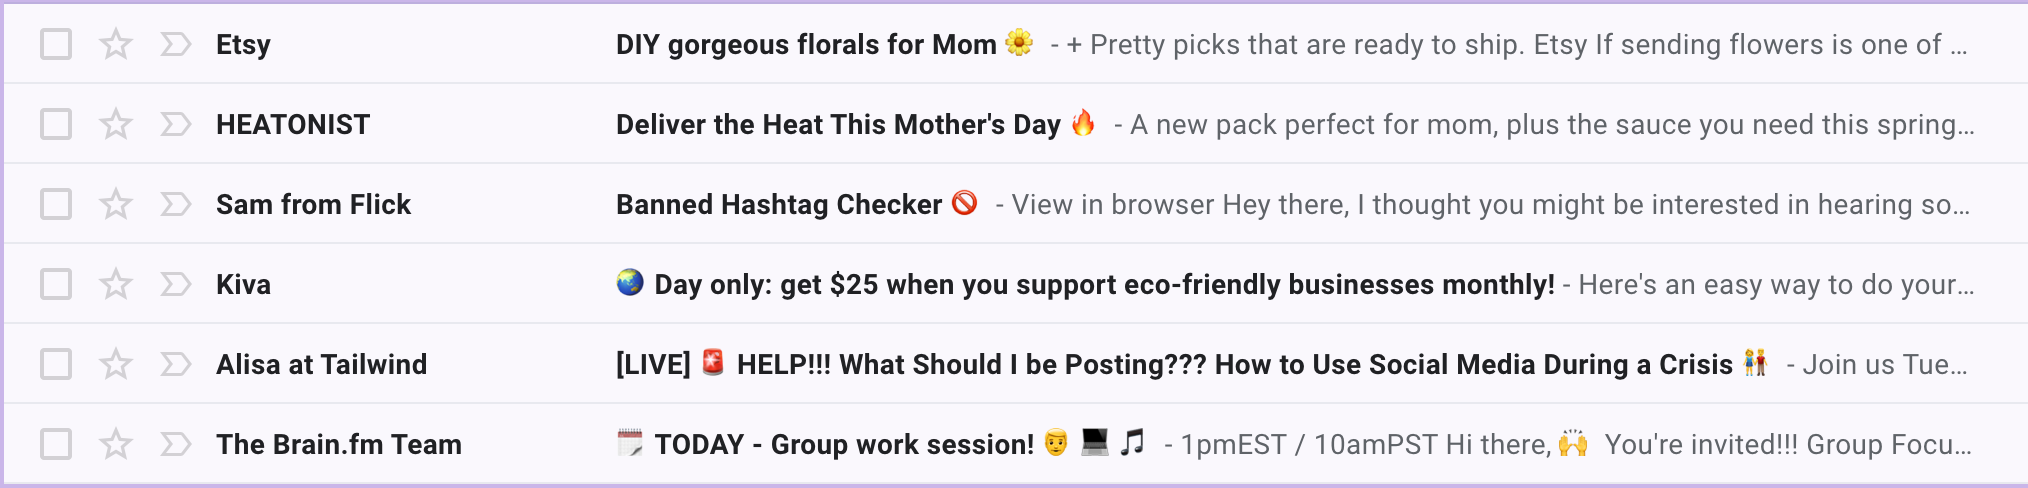 Sử dụng Emoji trong Email Marketing